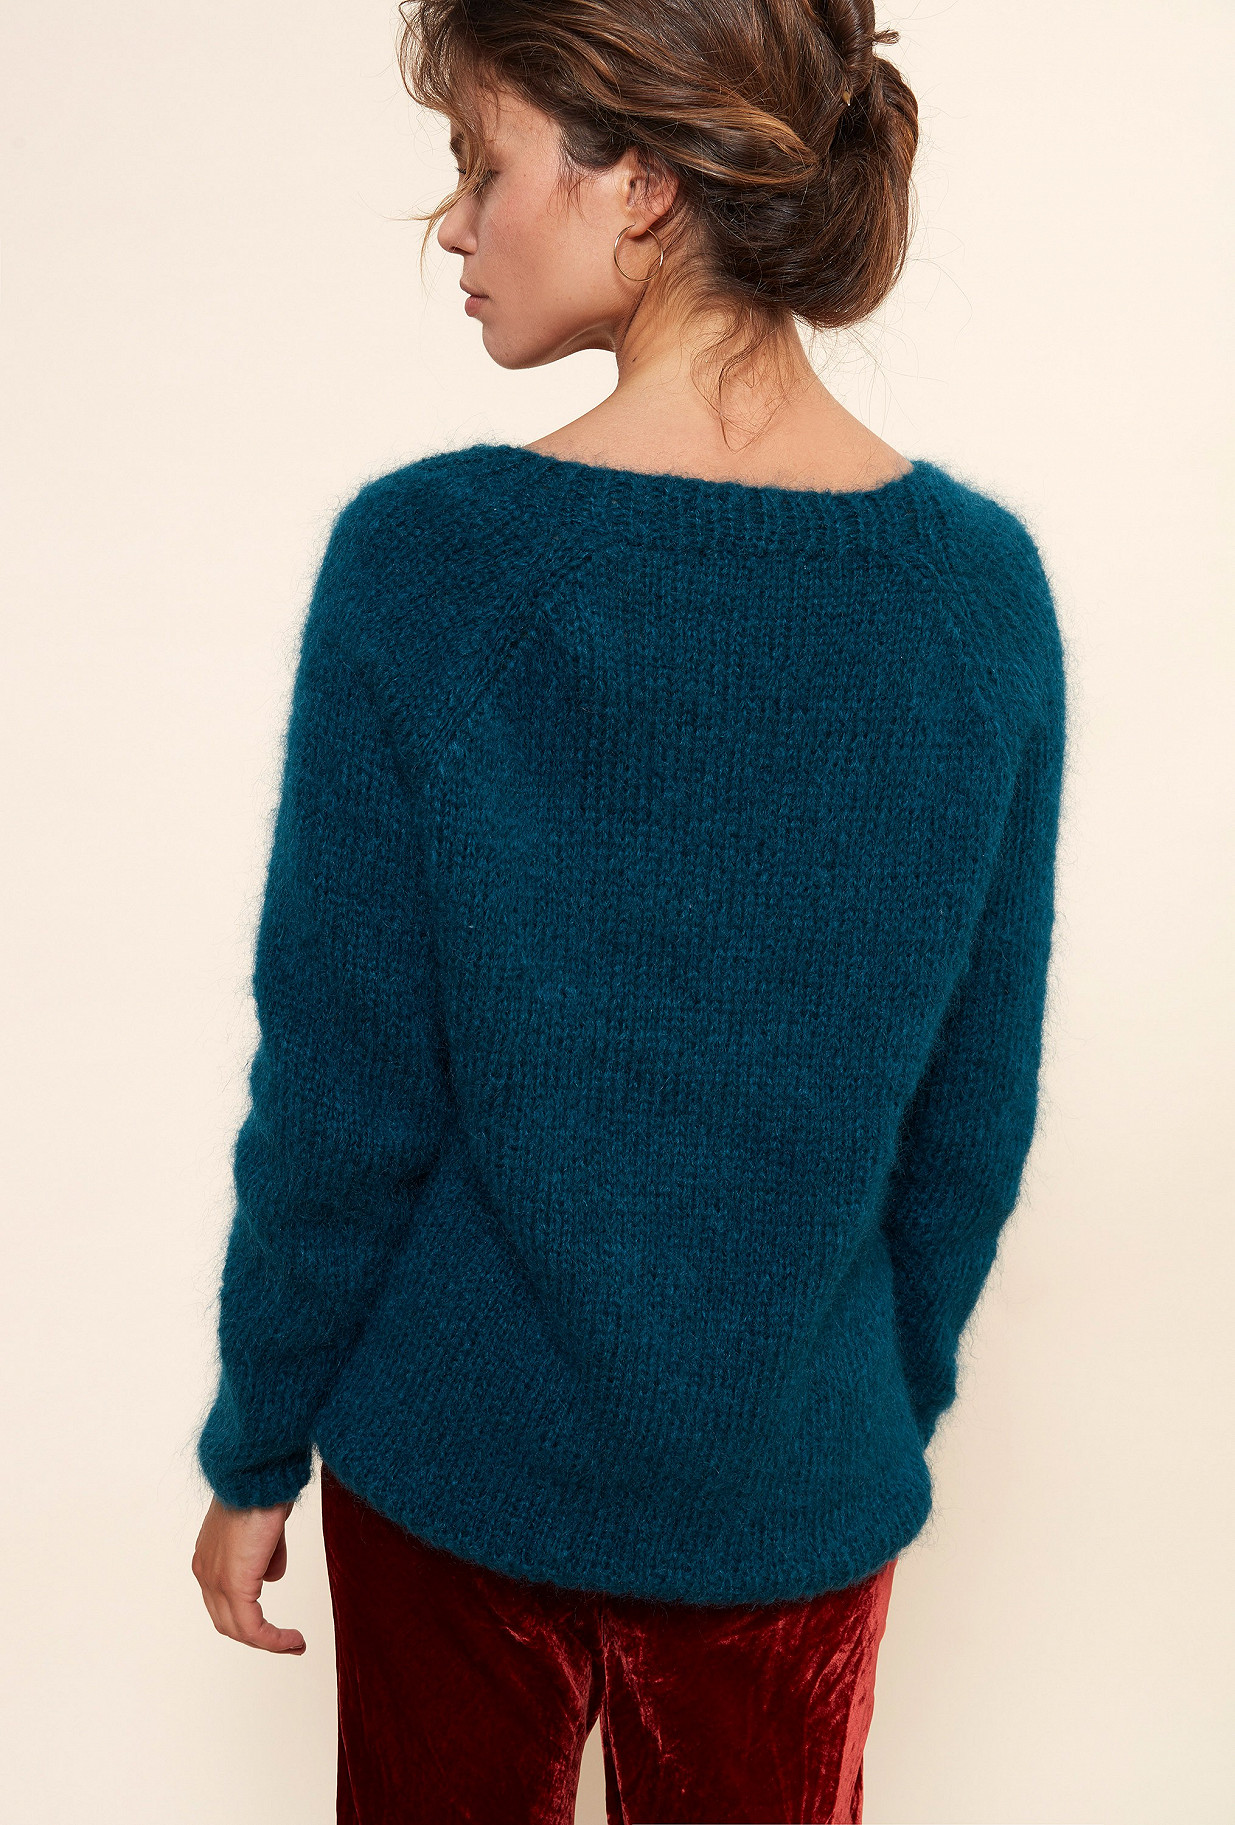 Green  Knit  Juverny Mes demoiselles fashion clothes designer Paris